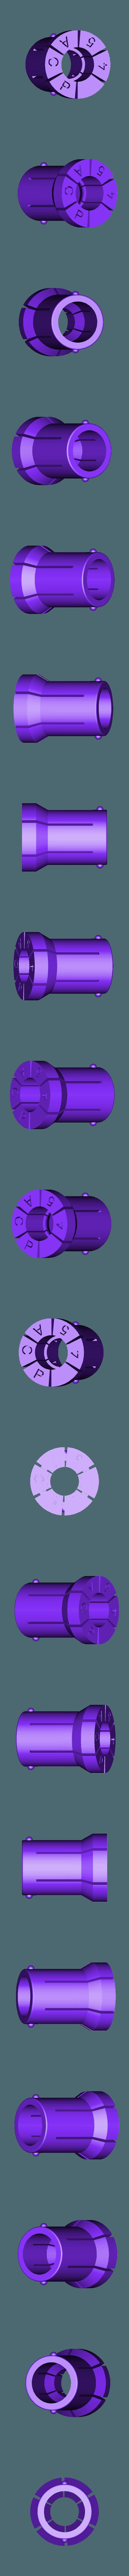 insert.45ACP.stl Download free STL file Bullet puller • 3D printable design, LionFox